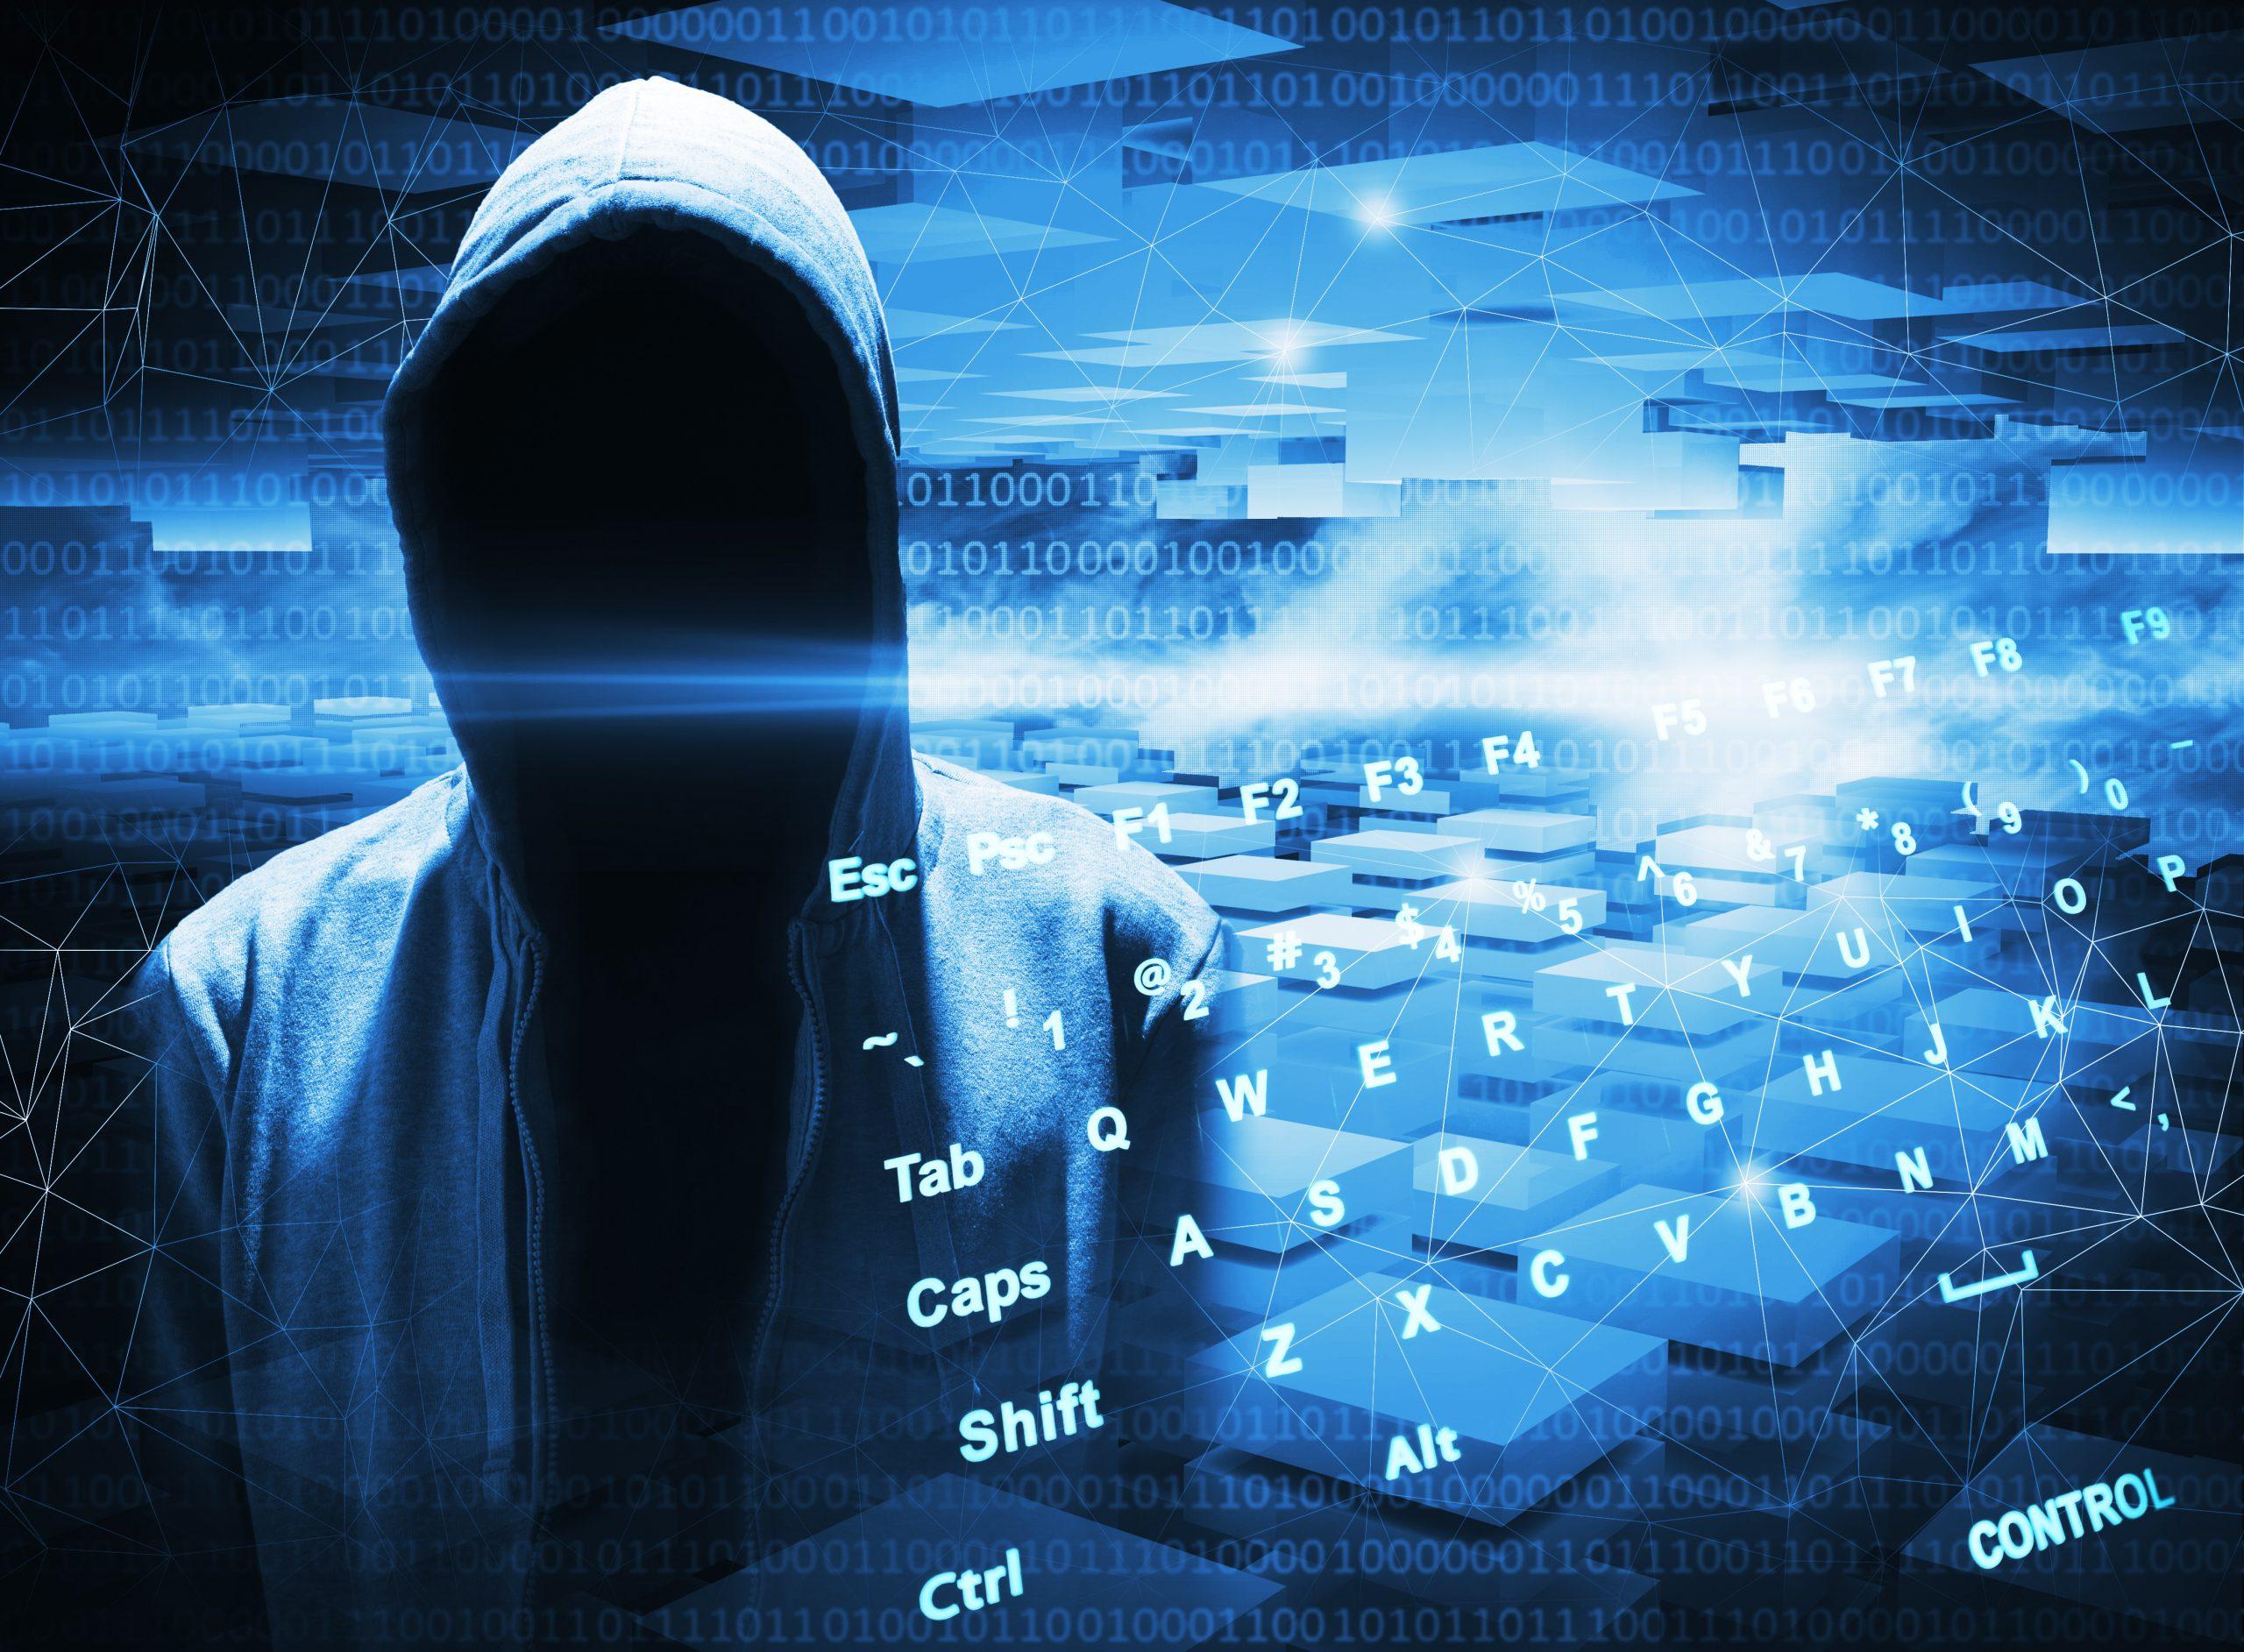 BS_Hacker in a hood_Eugene Sergeev_66230920